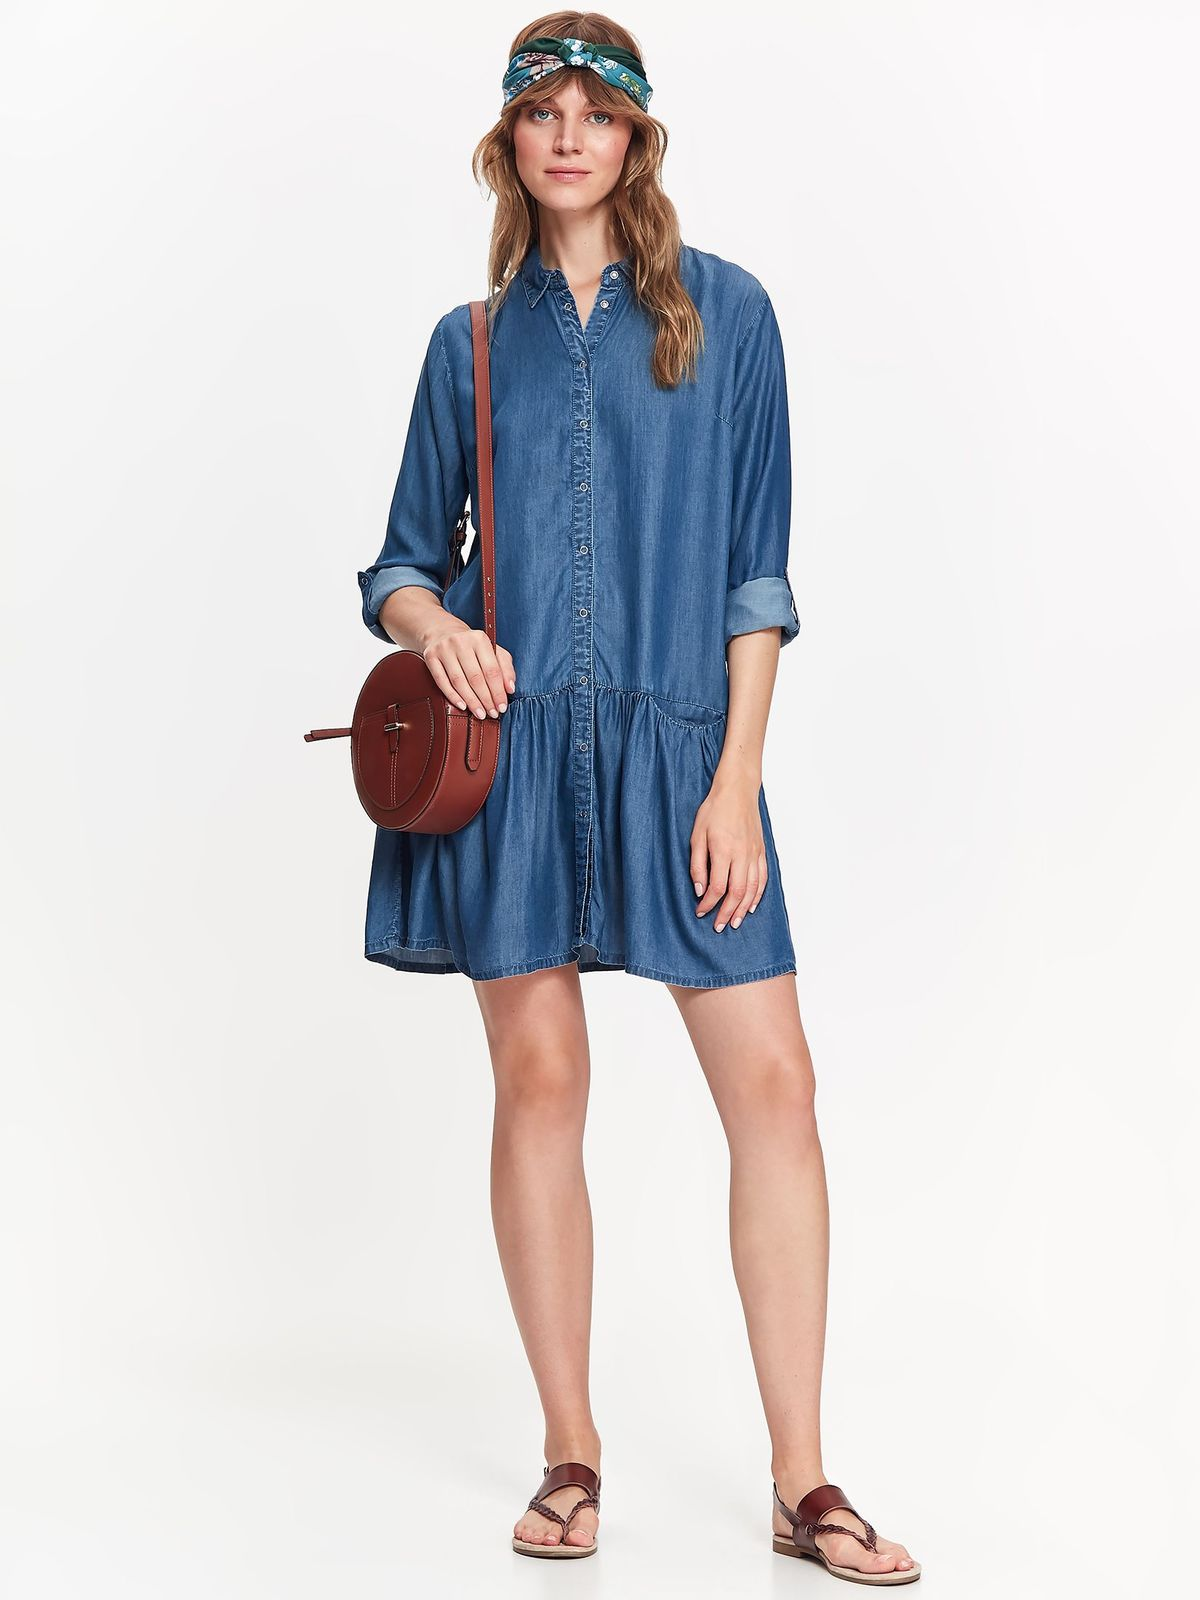 TOP SECRET TOP SECRET φορεμα soft denim